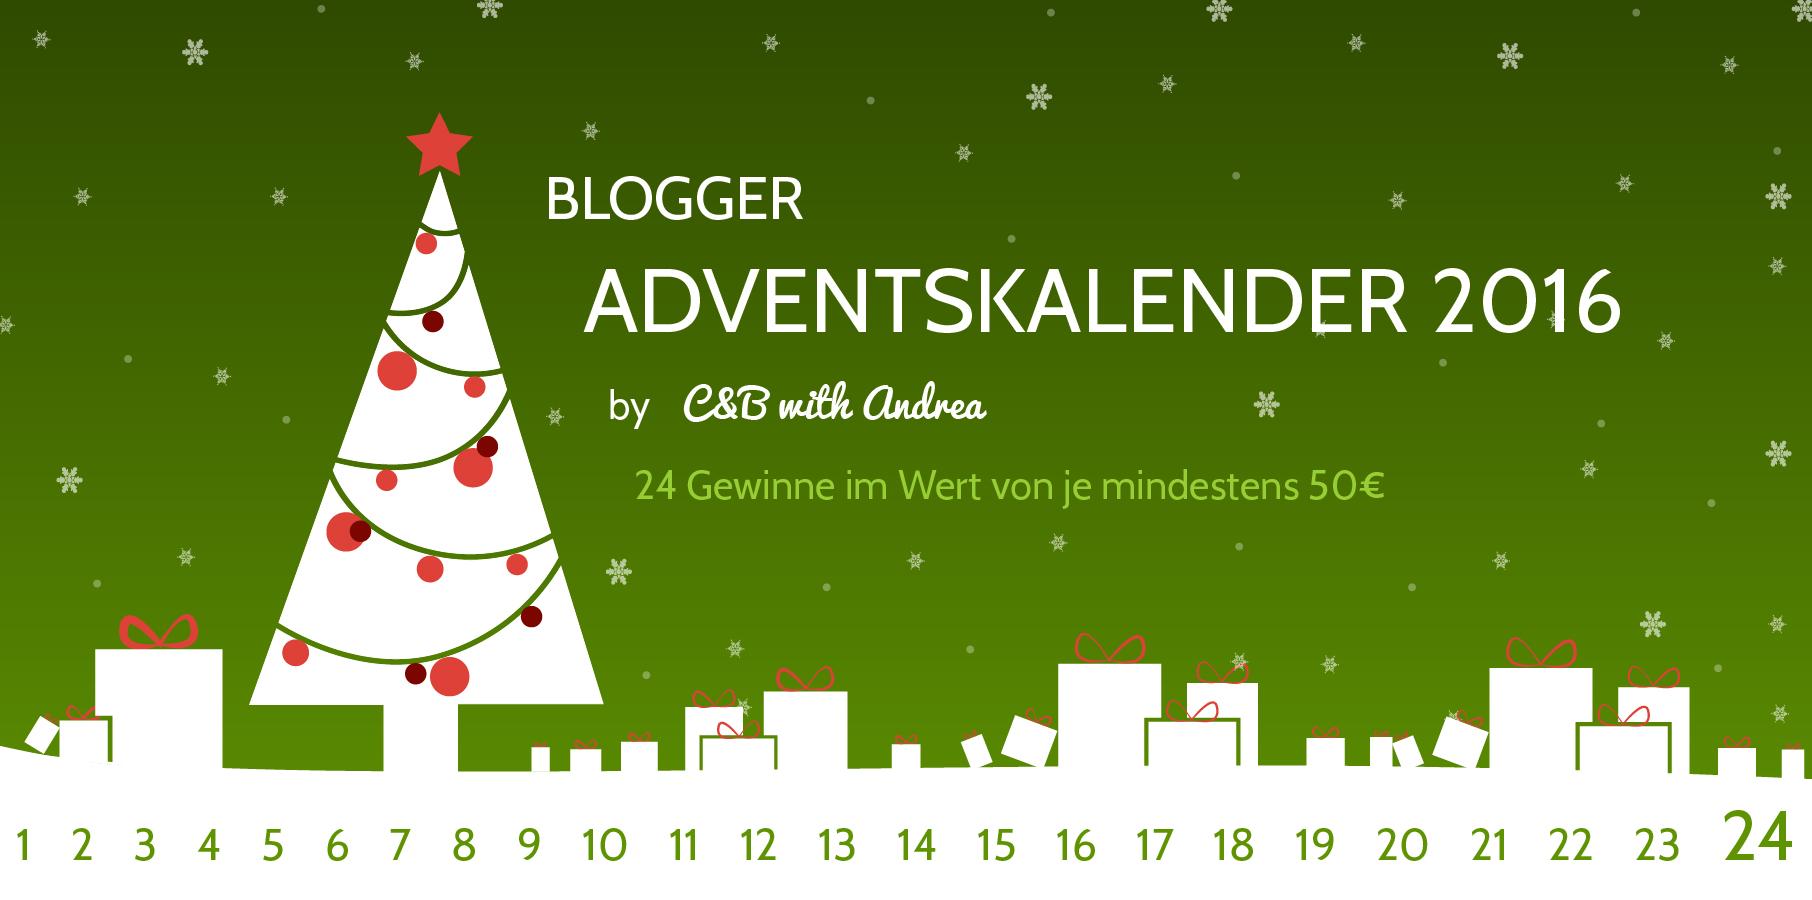 cb-with-andrea-blogger-adventskalender-gewinnspiel-www-candbwithandrea-com24